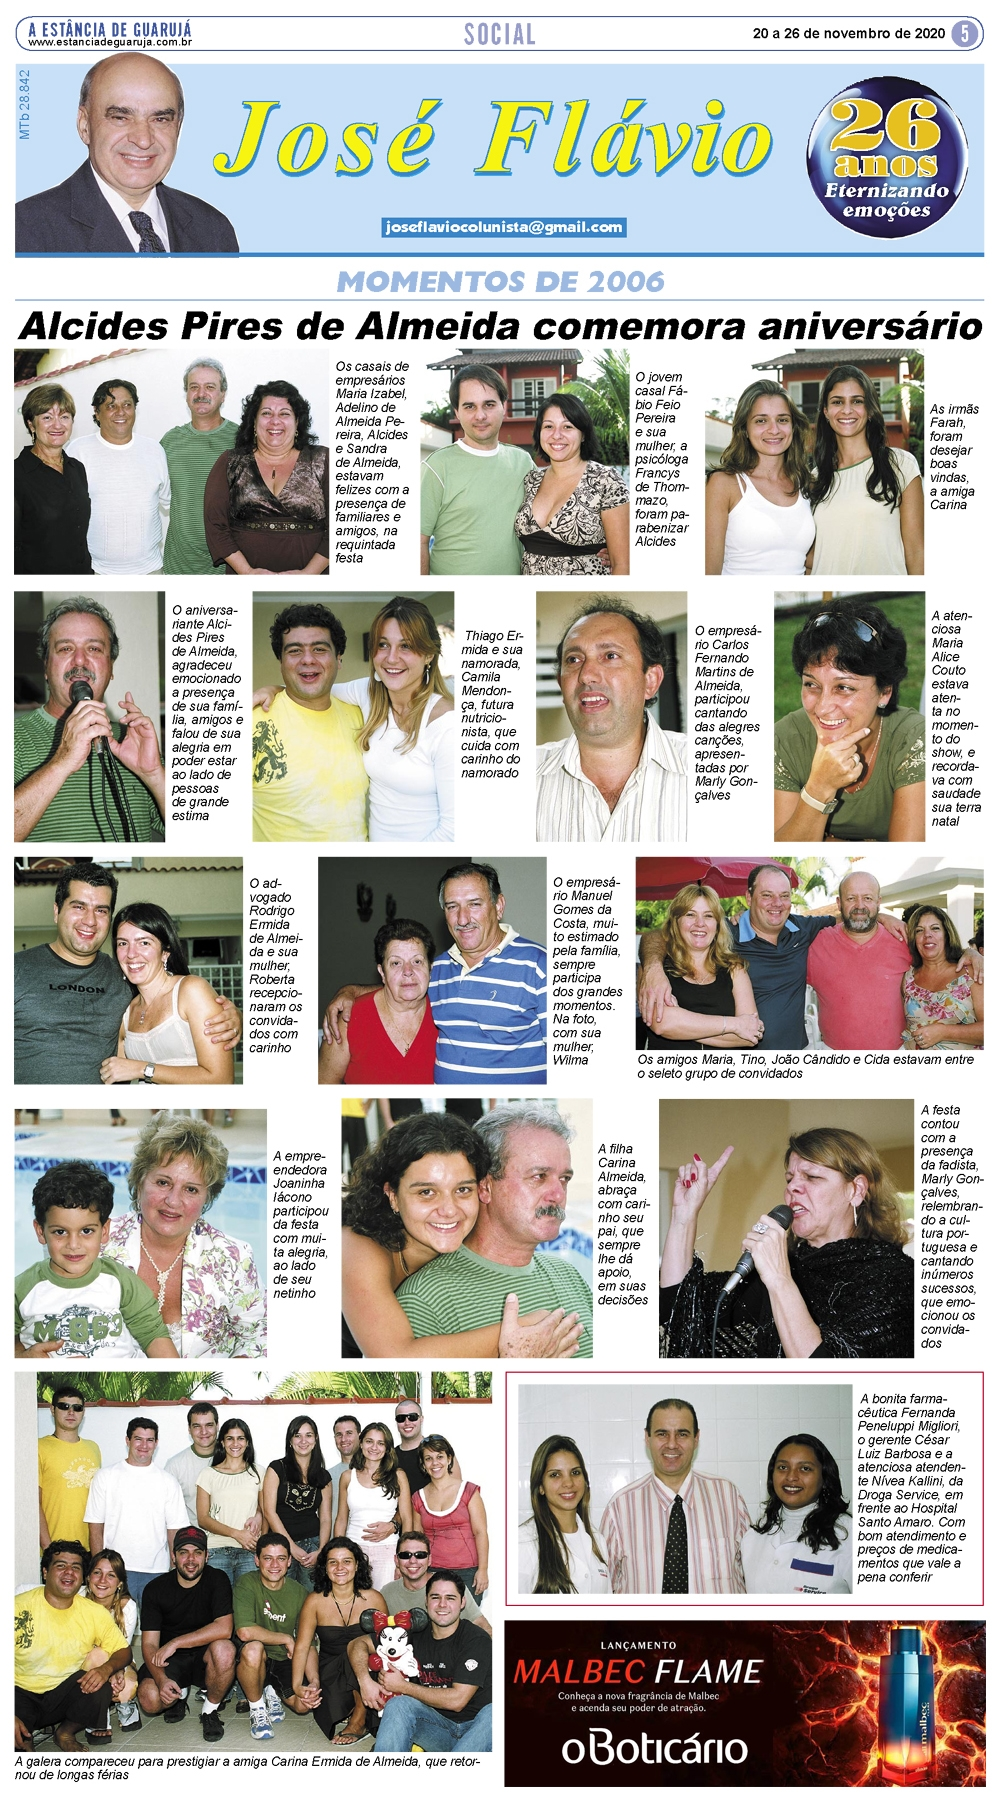 Alcides Pires de Almeida comemora aniversário